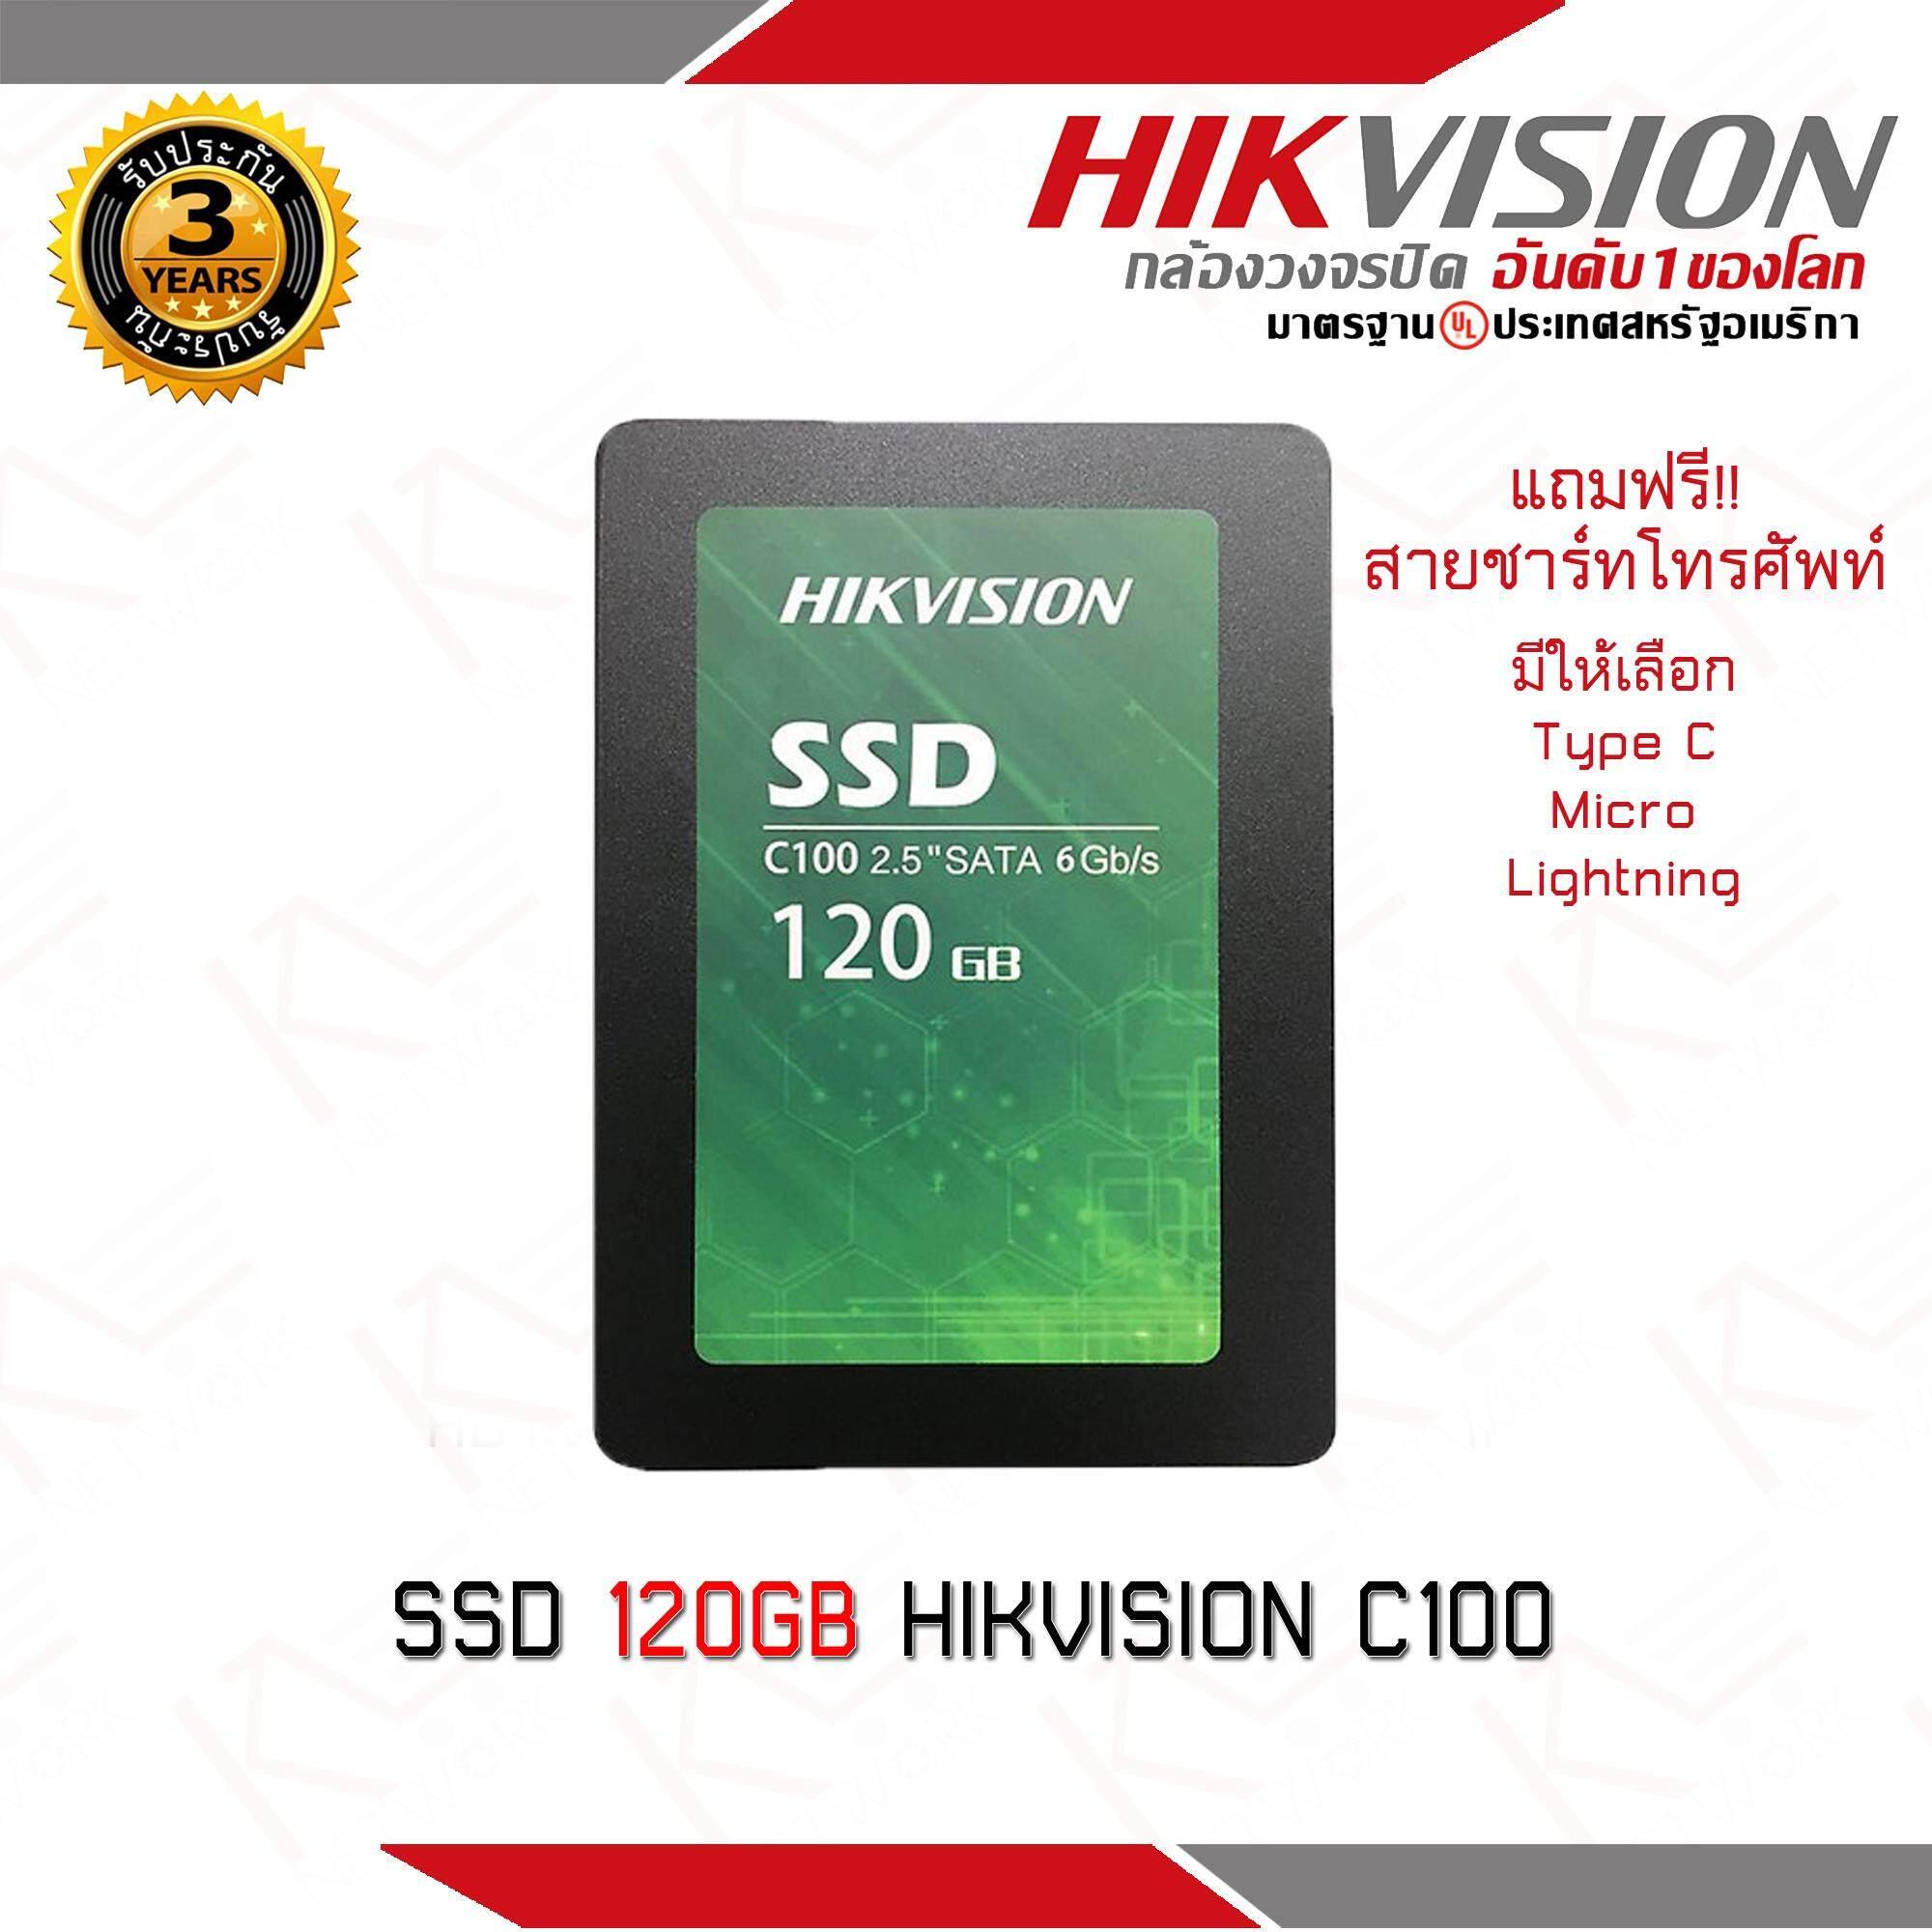 Hikvision Ssd ความจุ 120gb รุ่น C100 Read Speed (mb/s): 550mb/s ,write Speed (mb/s): 420mb/s รับประกัน 3 ปี.